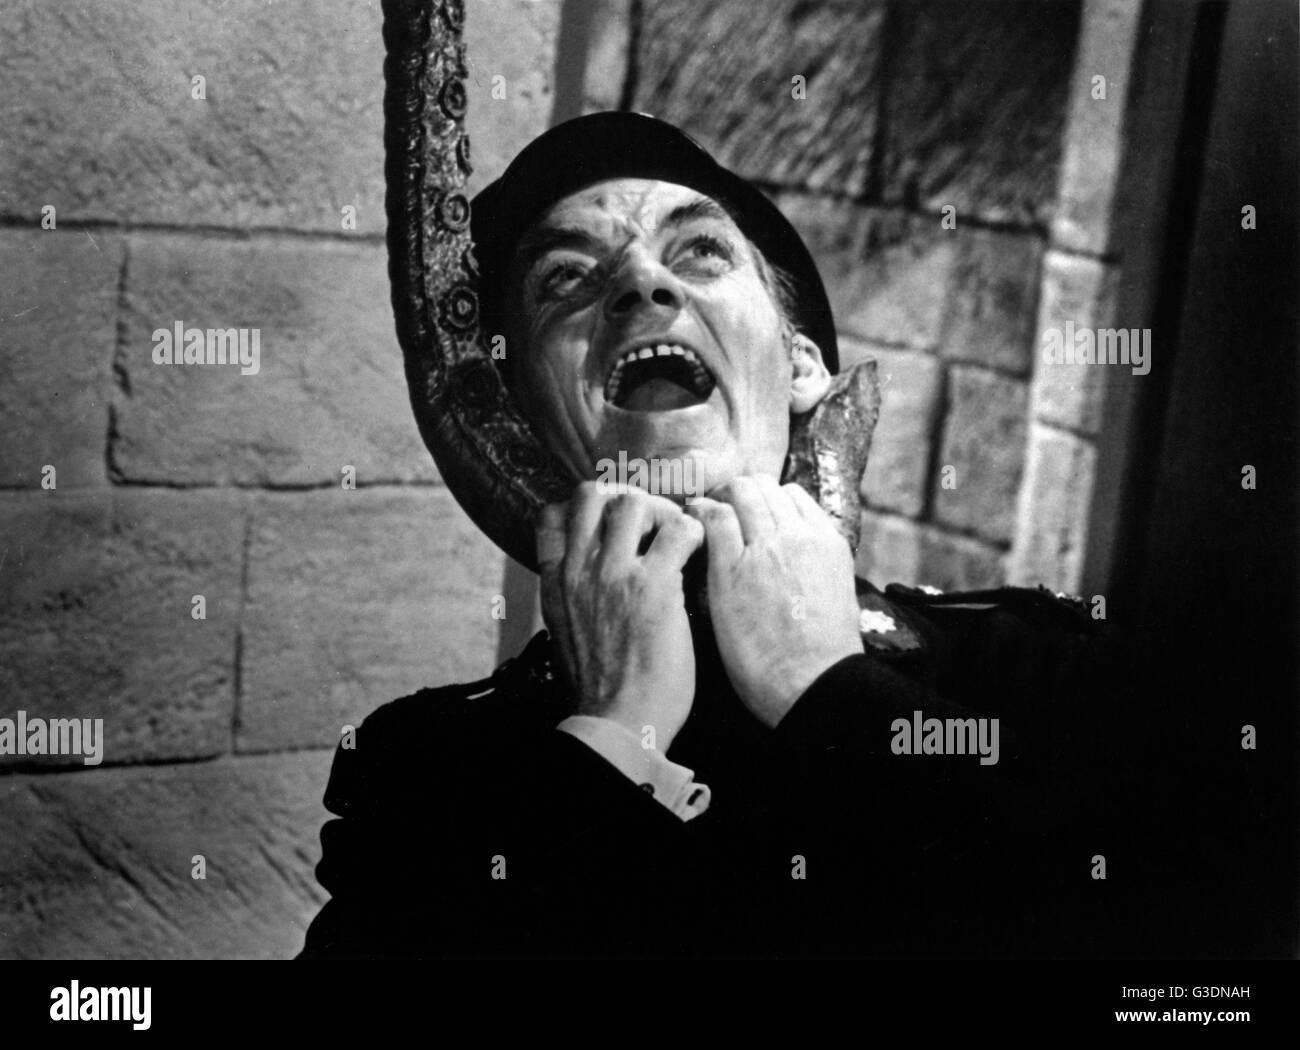 Island Of Terror, aka: Insel des Schreckens, aka: Todesmonster greifen an, Großbritannien 1966, Regie: Terence - Stock Image